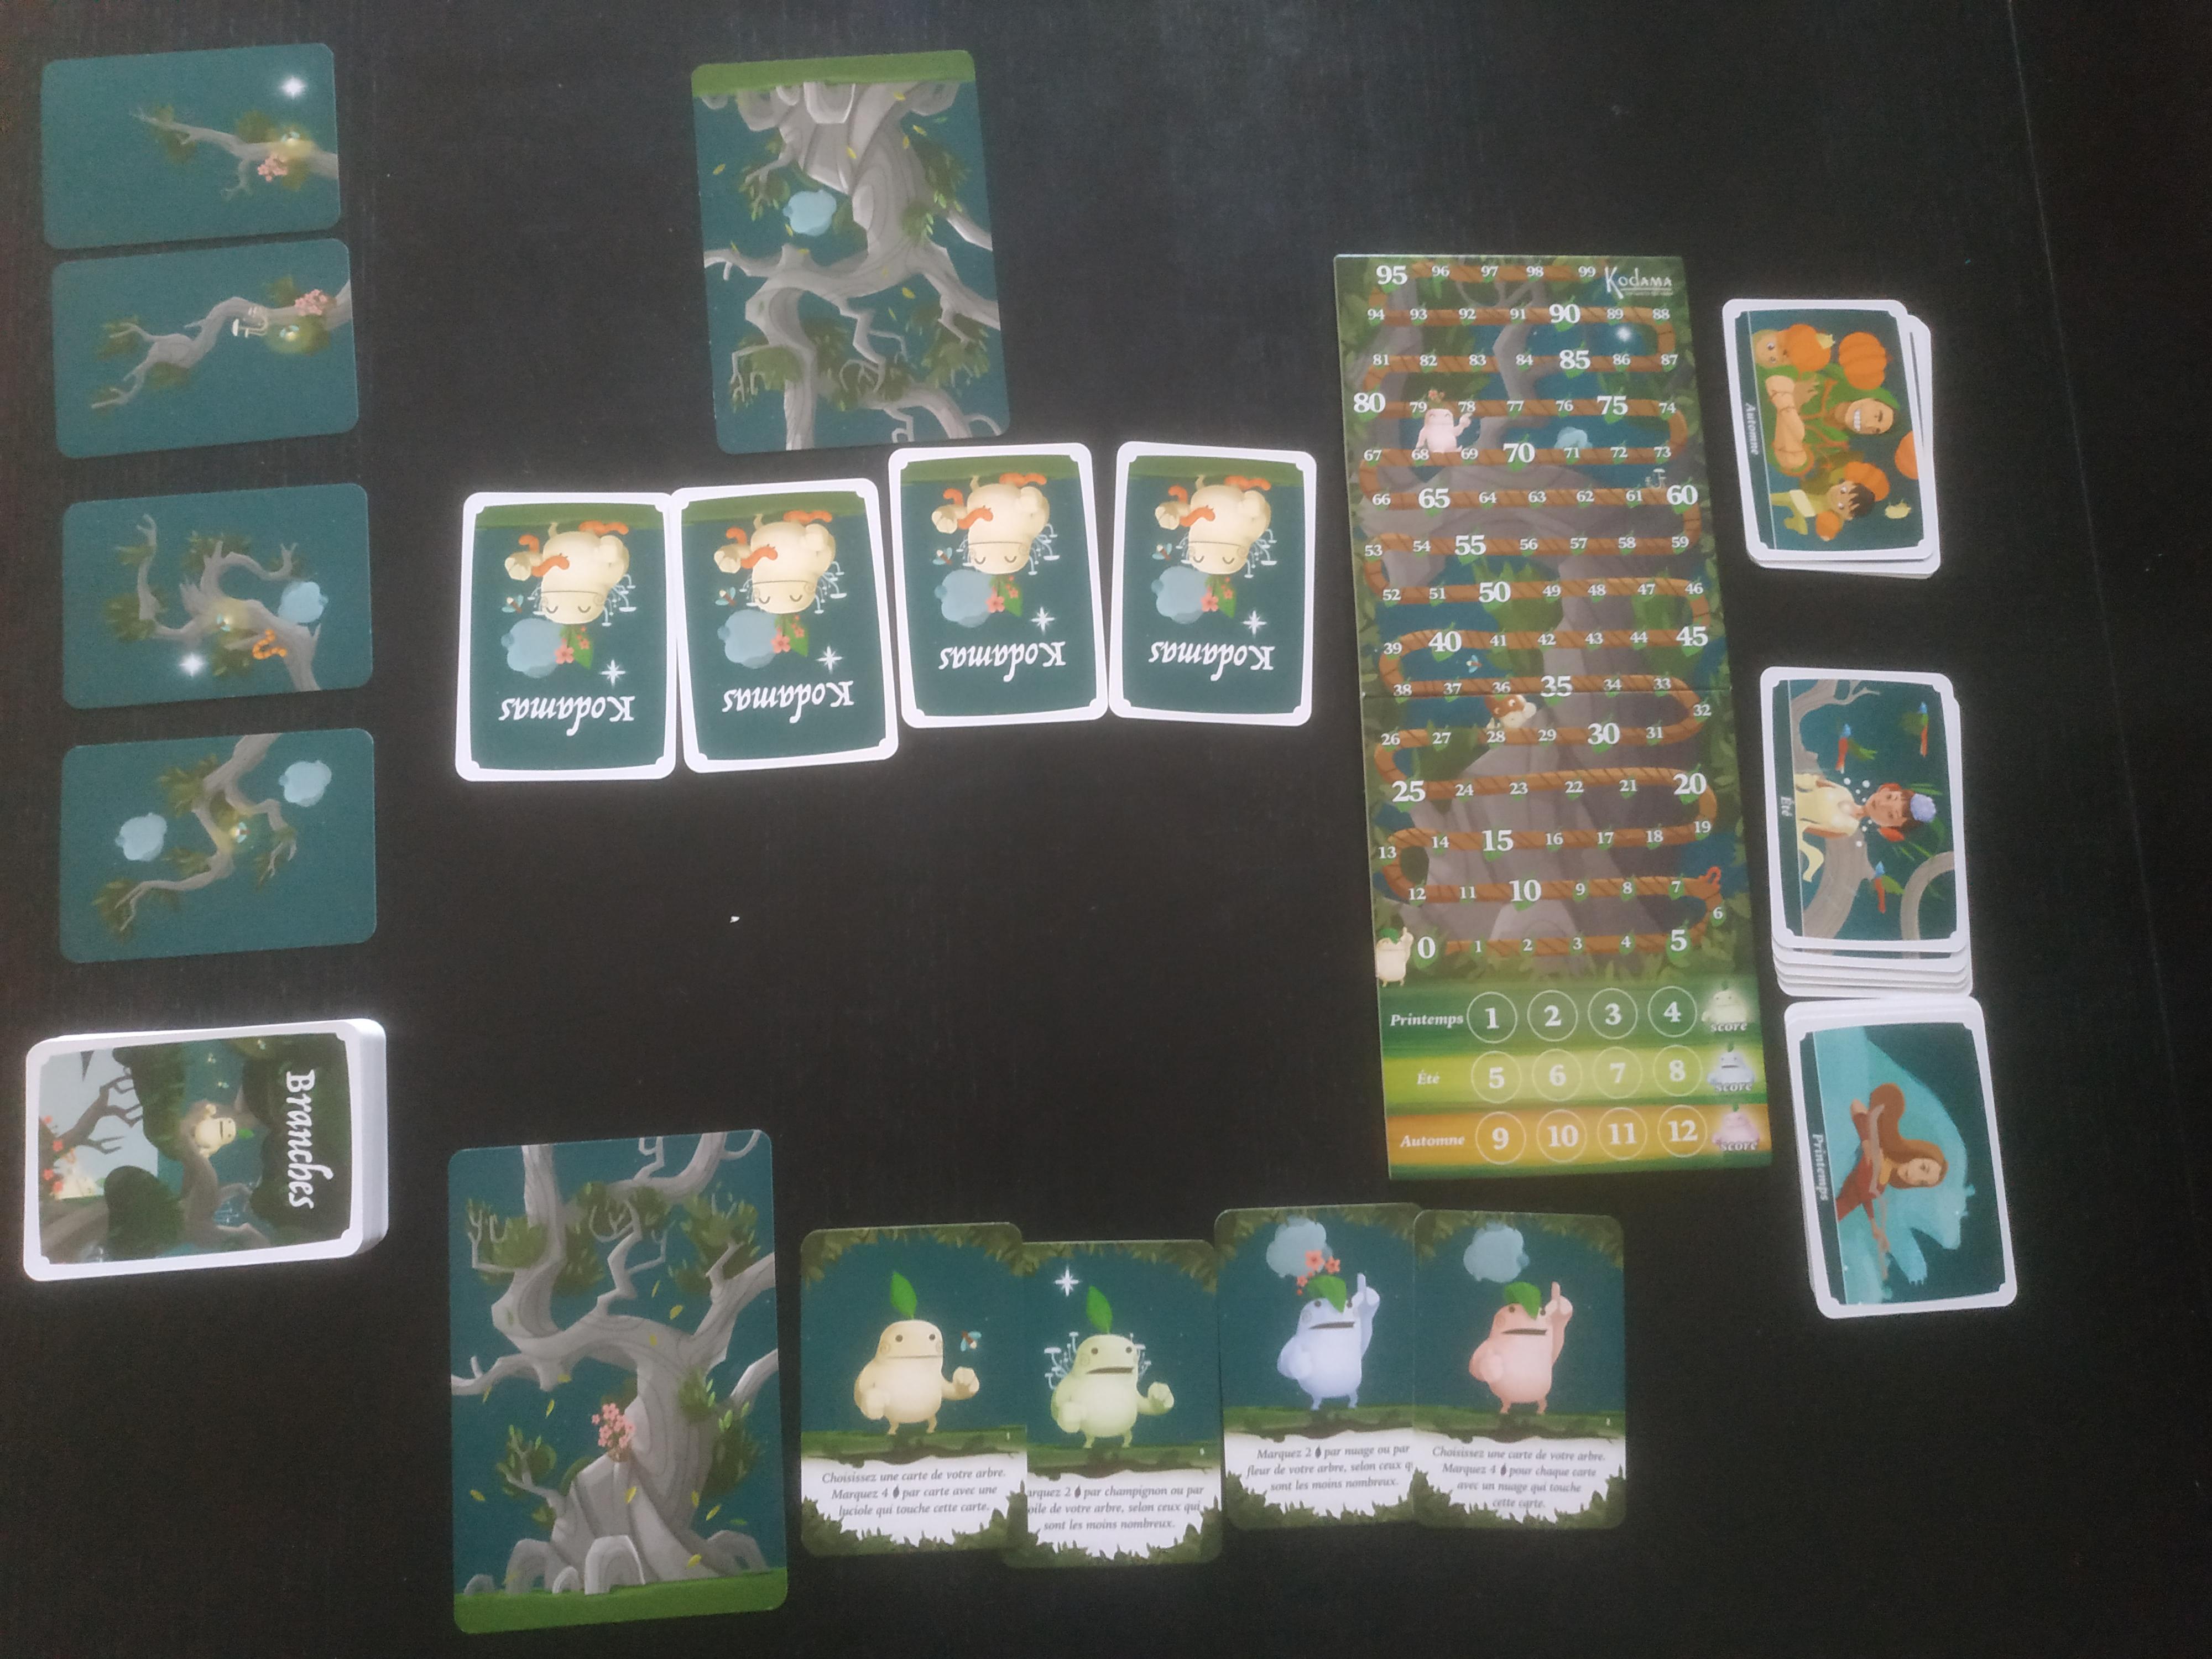 kodama-jeu-societe-japon-nature-arbre-zen-famille-pose-cartes